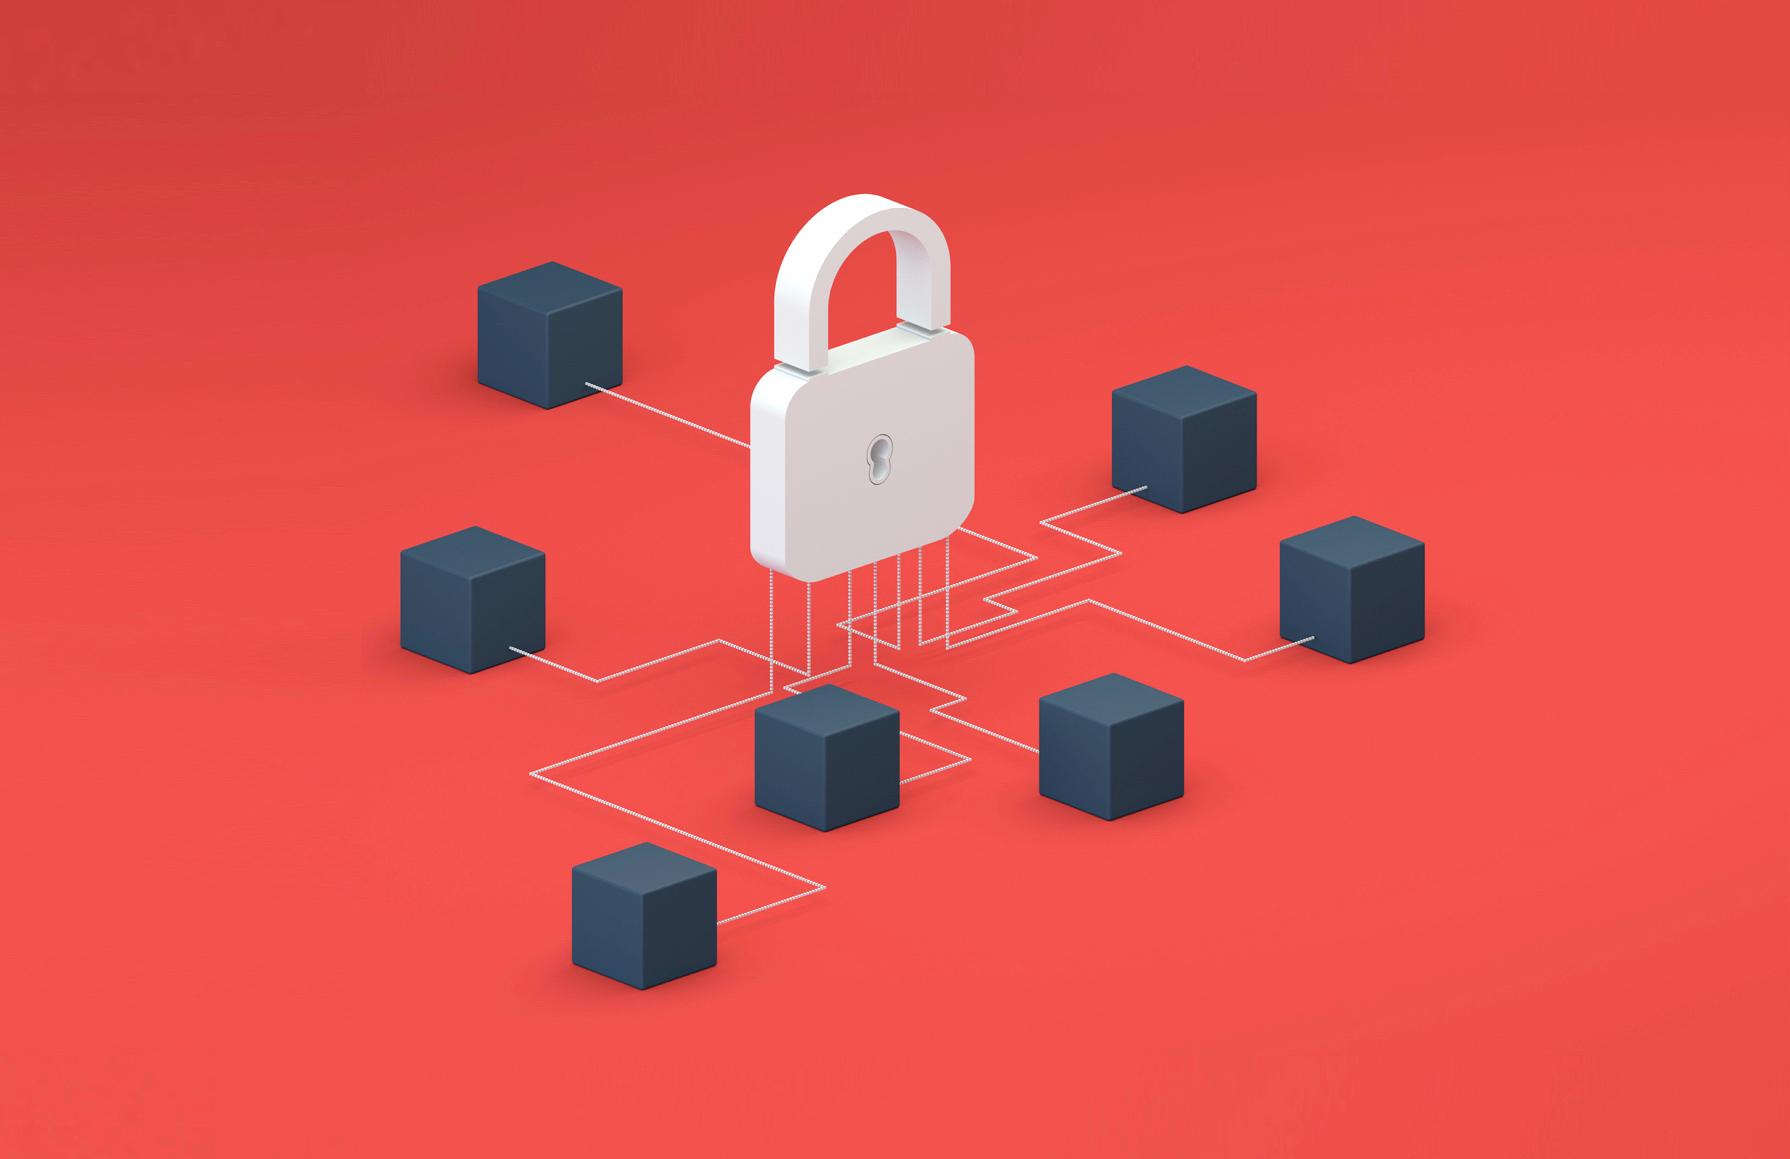 Cybersecurity startup SpiderSilk raises $2.25M to help prevent data breaches